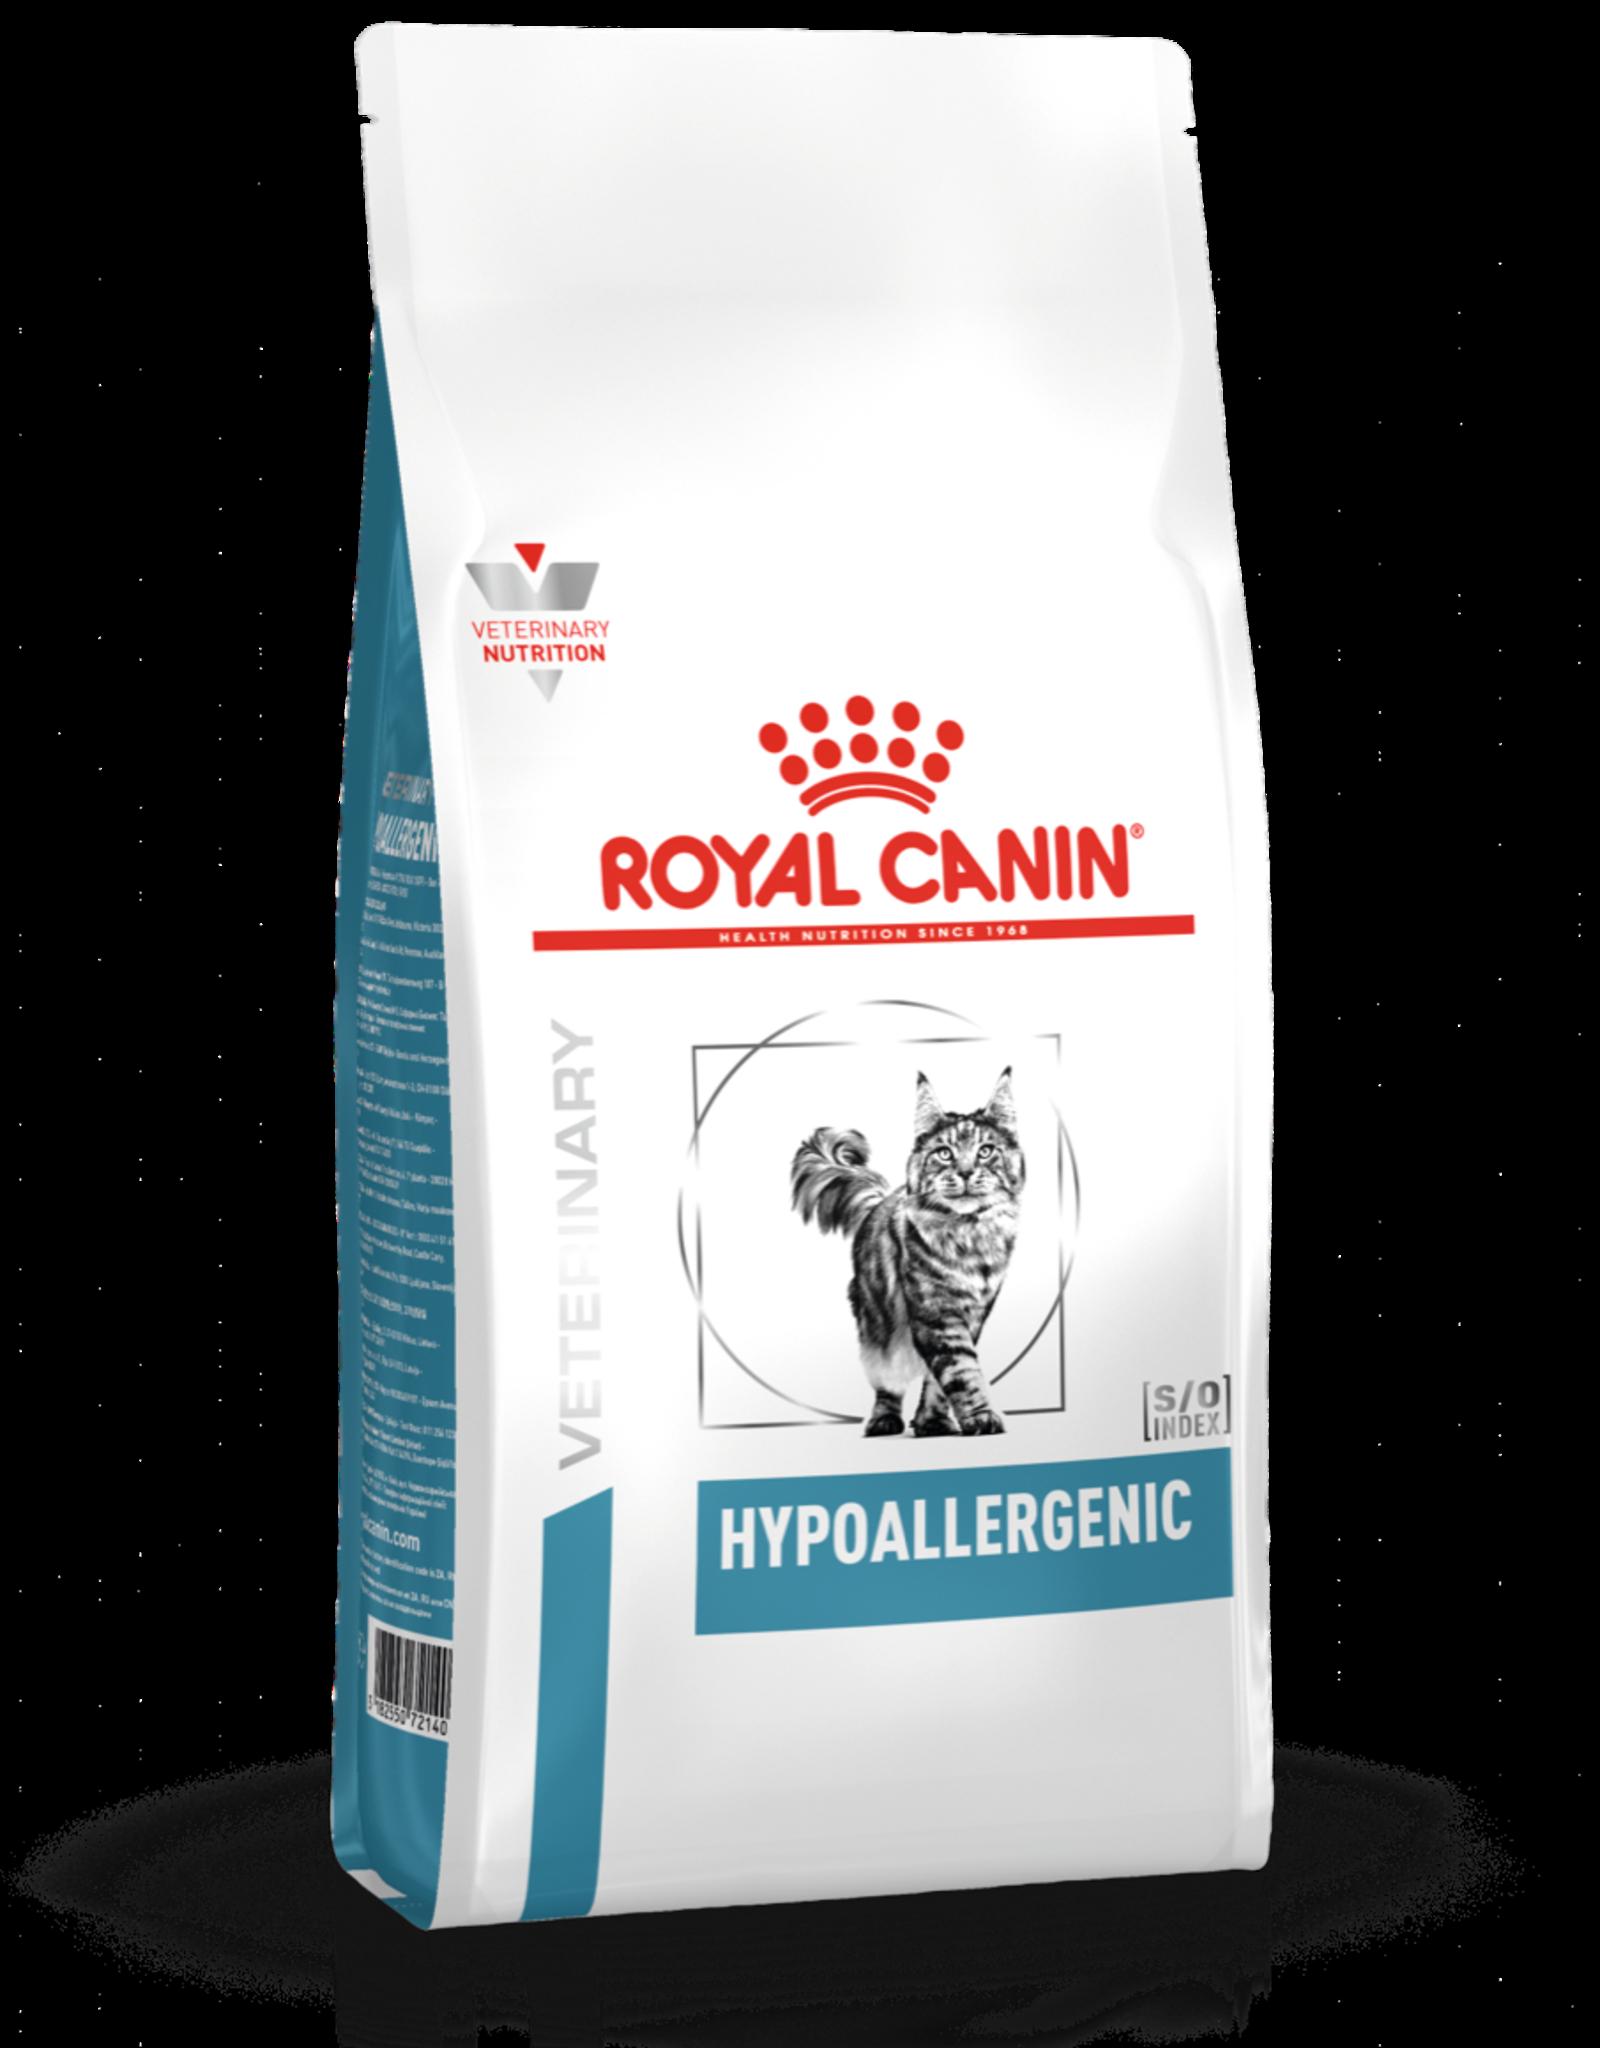 Royal Canin Royal Canin Hypoallergenic Katze 2,5kg